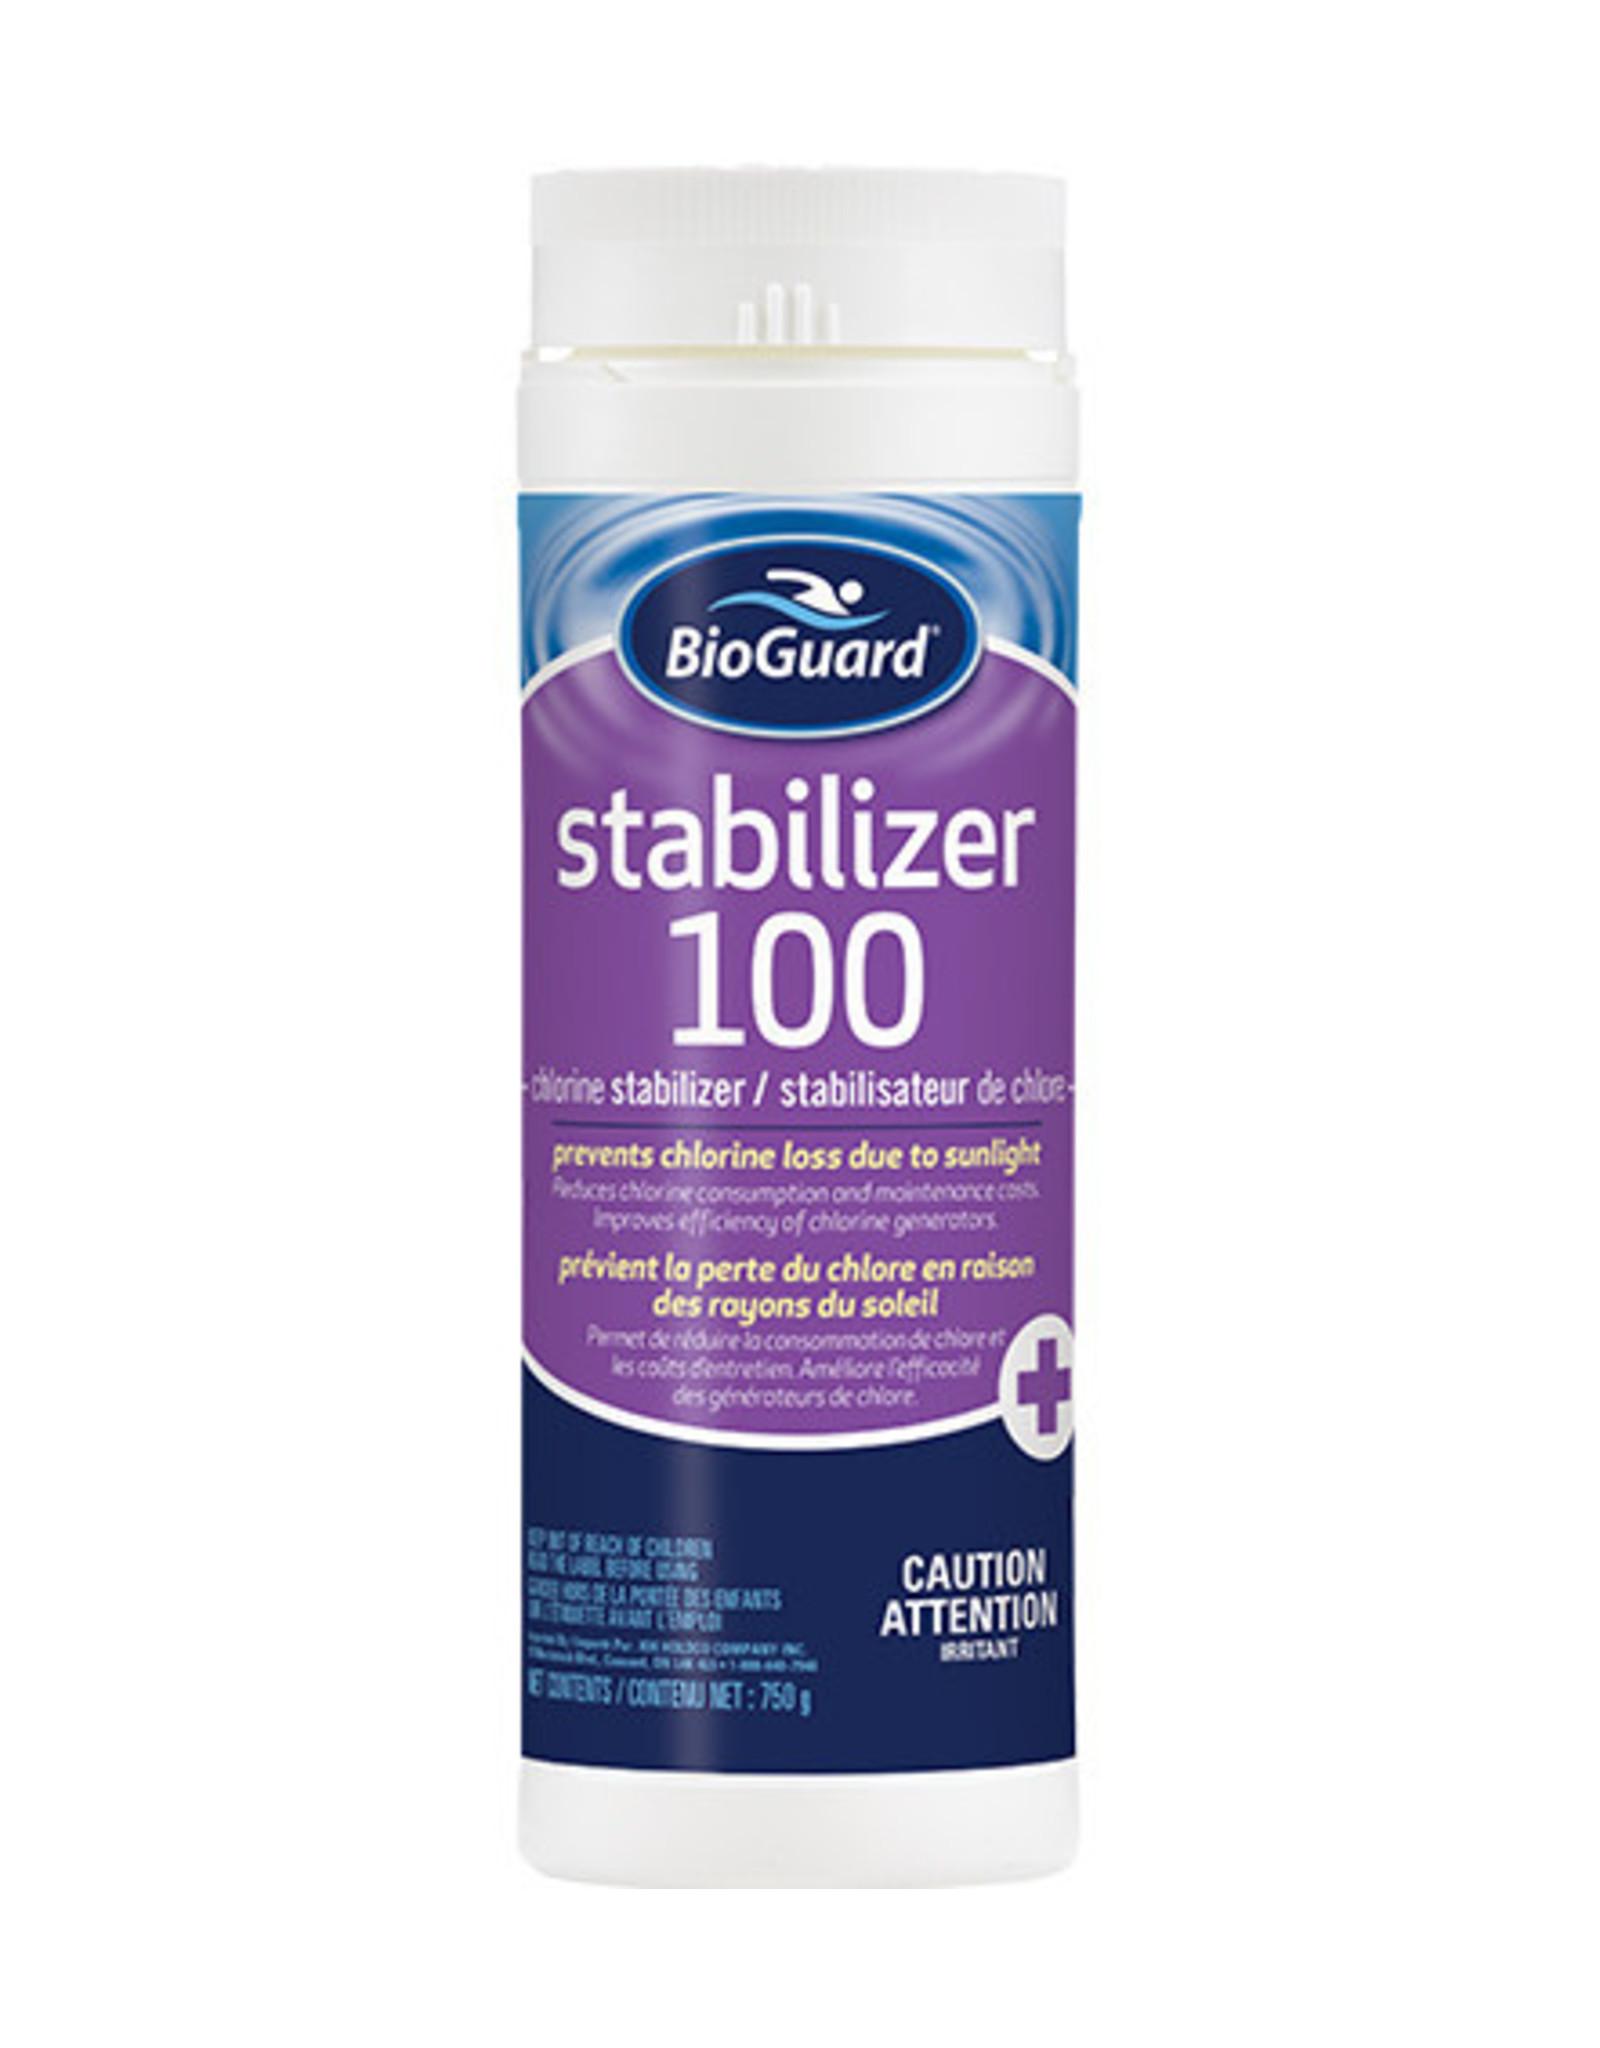 BIOGUARD BioGuard Stabilizer 100 750g